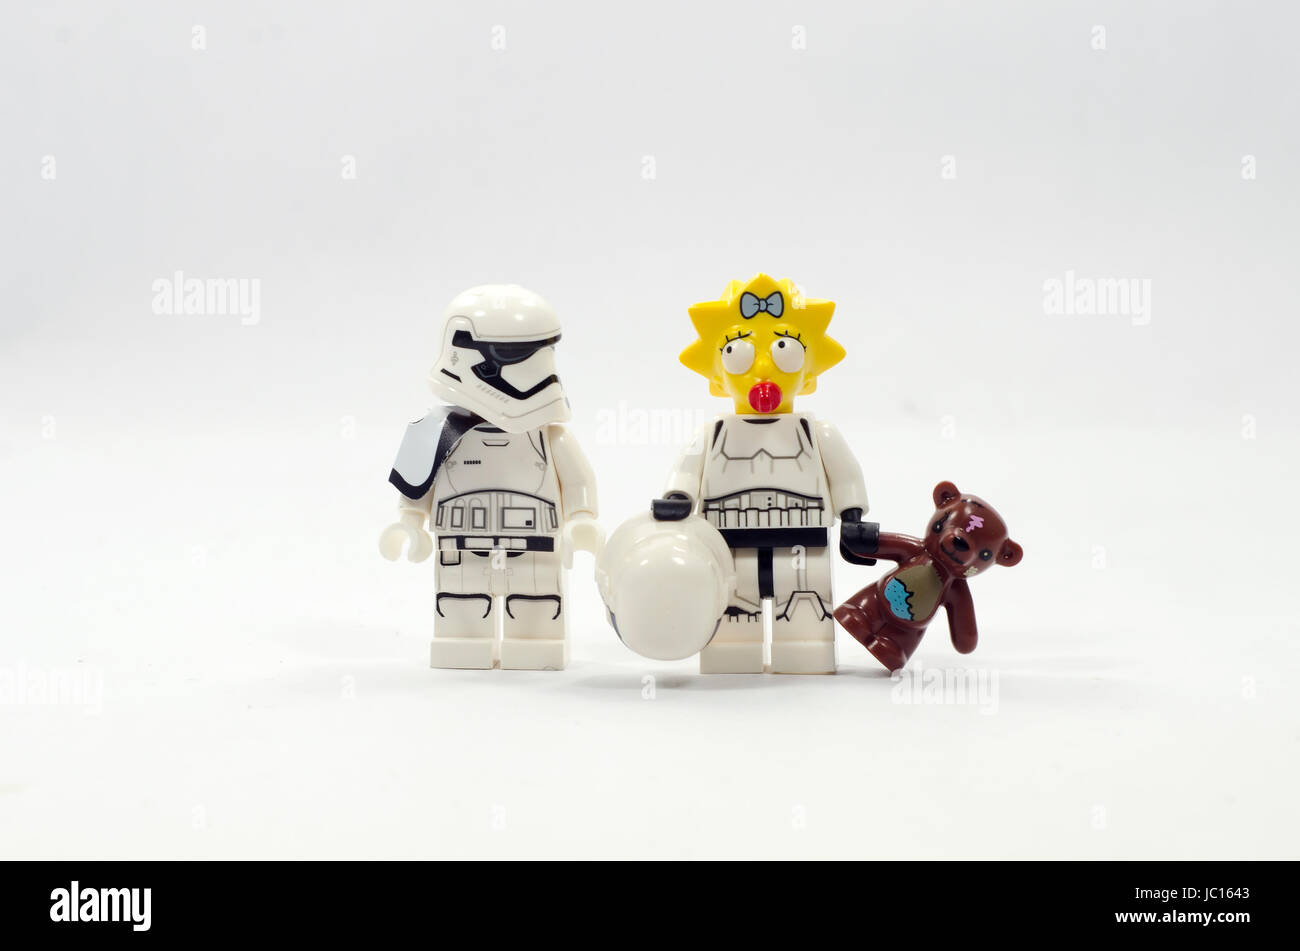 Lego minifigures maggie simpsons wearing stromtrooper uniform - Stock Image